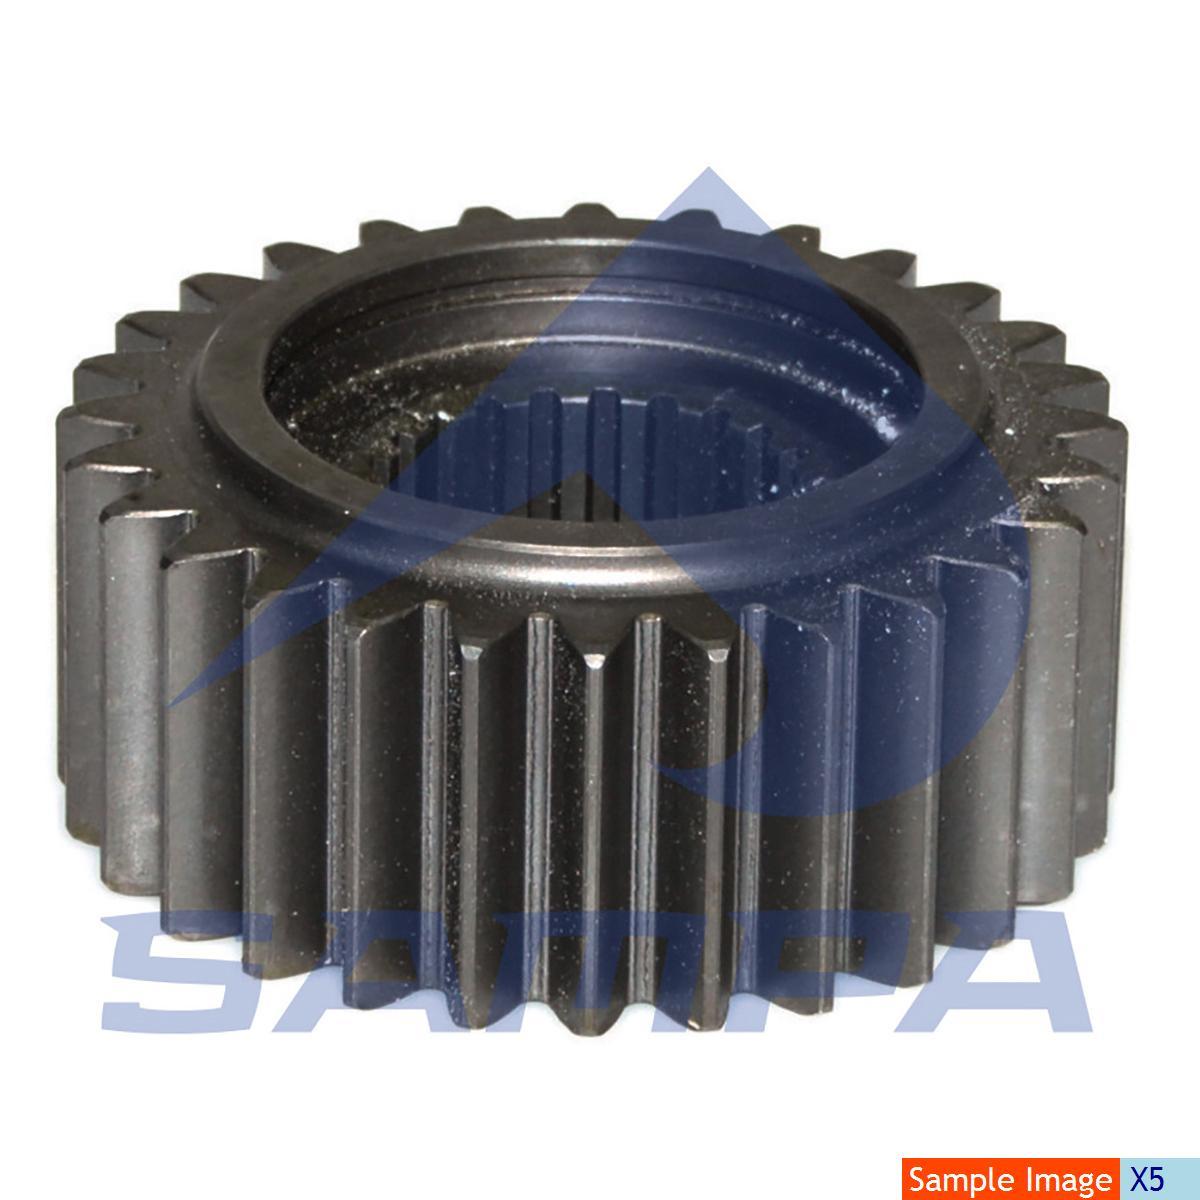 Gear Set, Planetary Gear, Iveco, Gear Box